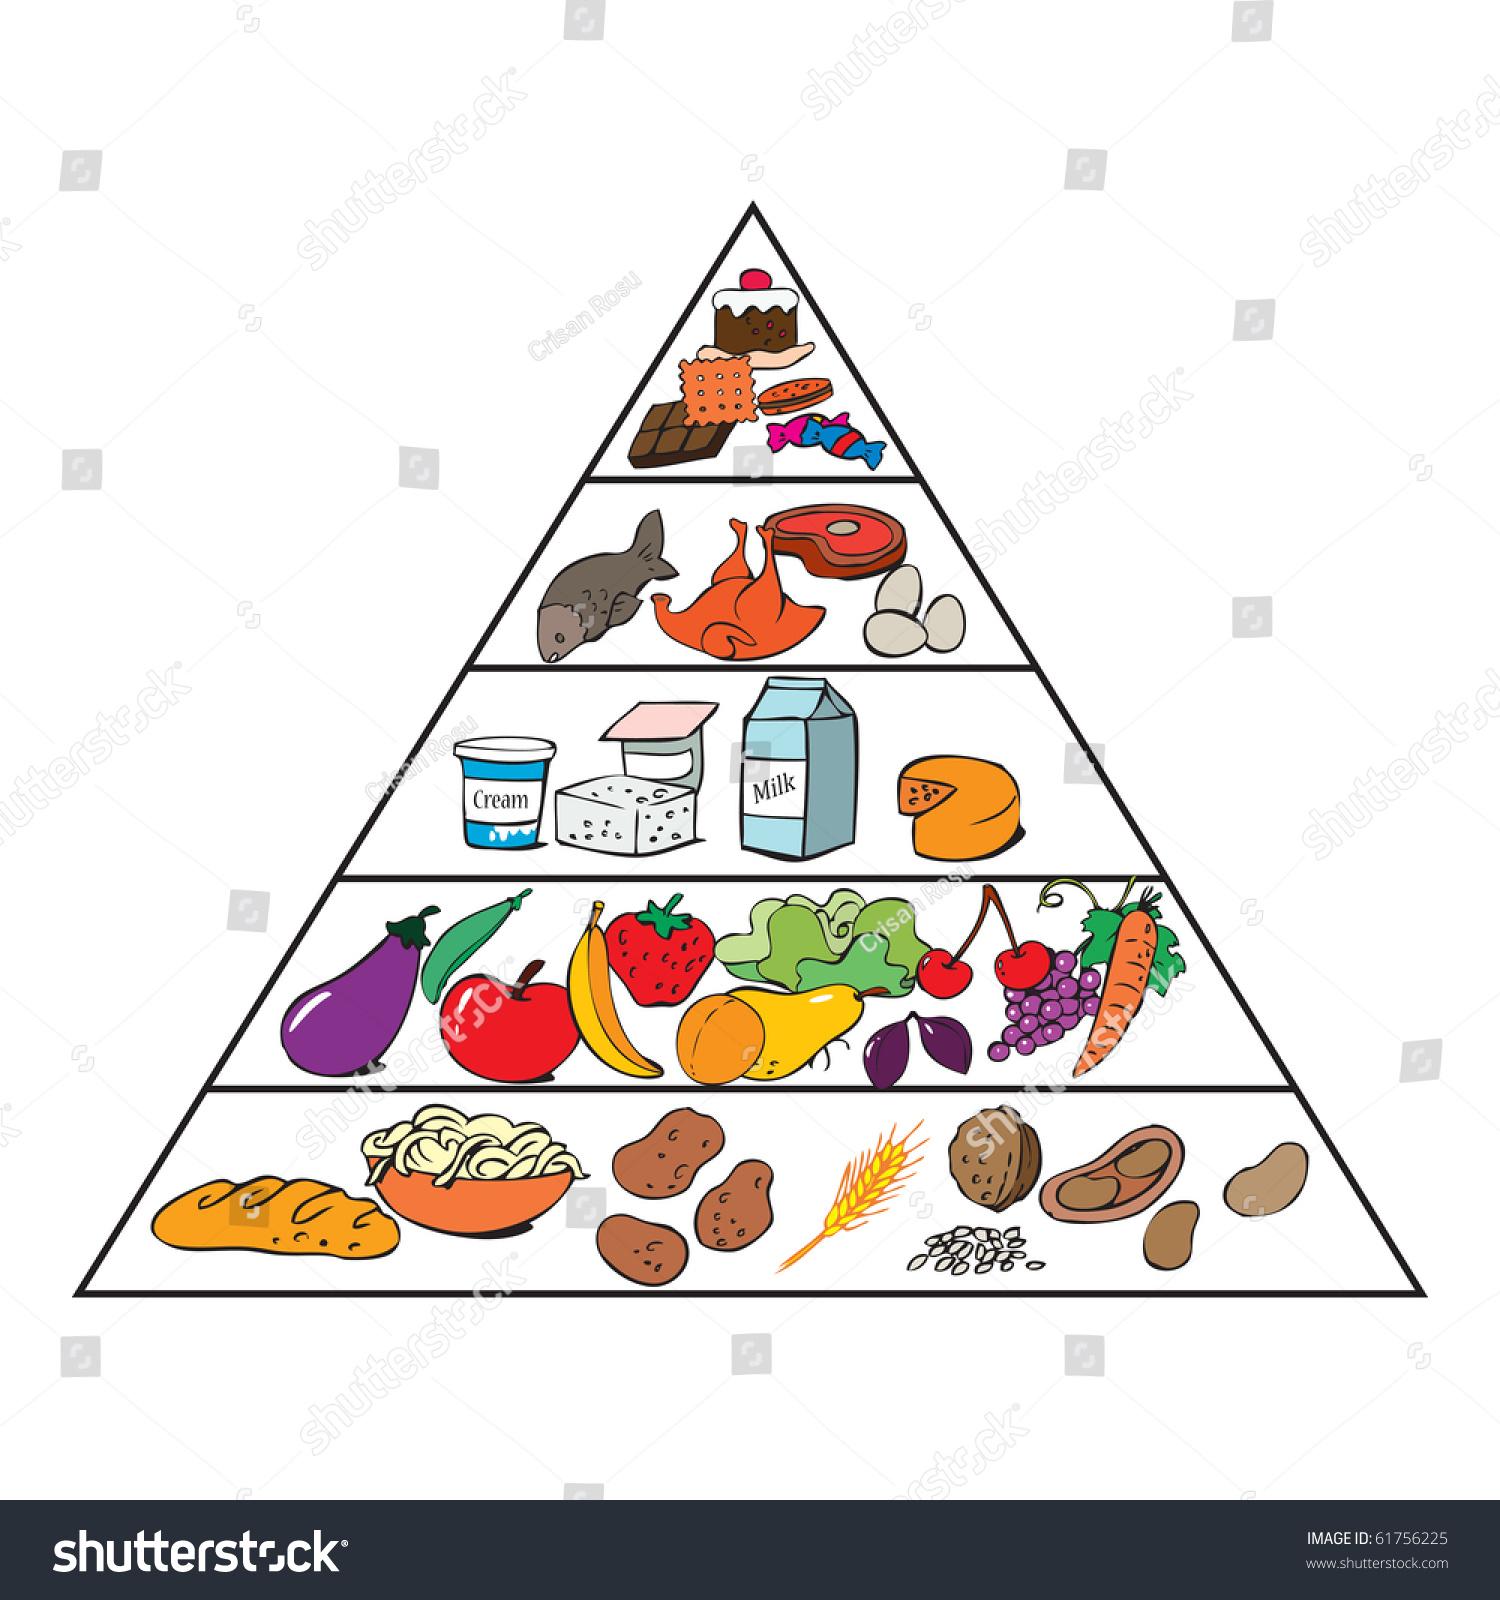 vector illustration food pyramid kids cartoon stock vector food pyramid clip art black and white food pyramid clip art simple